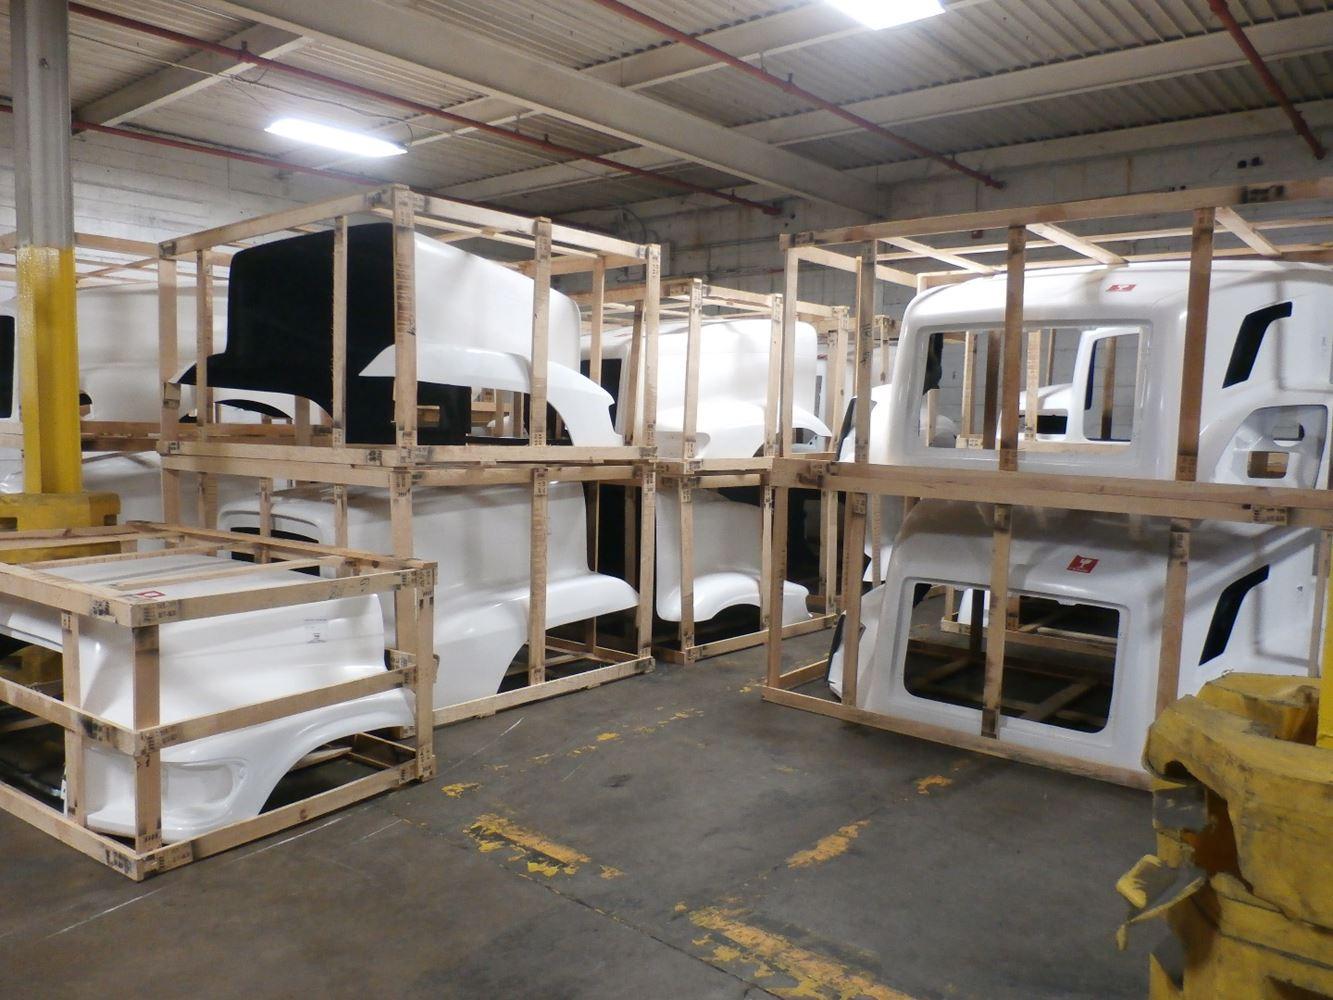 Media 5 for Freightliner COLUMBIA Hoods